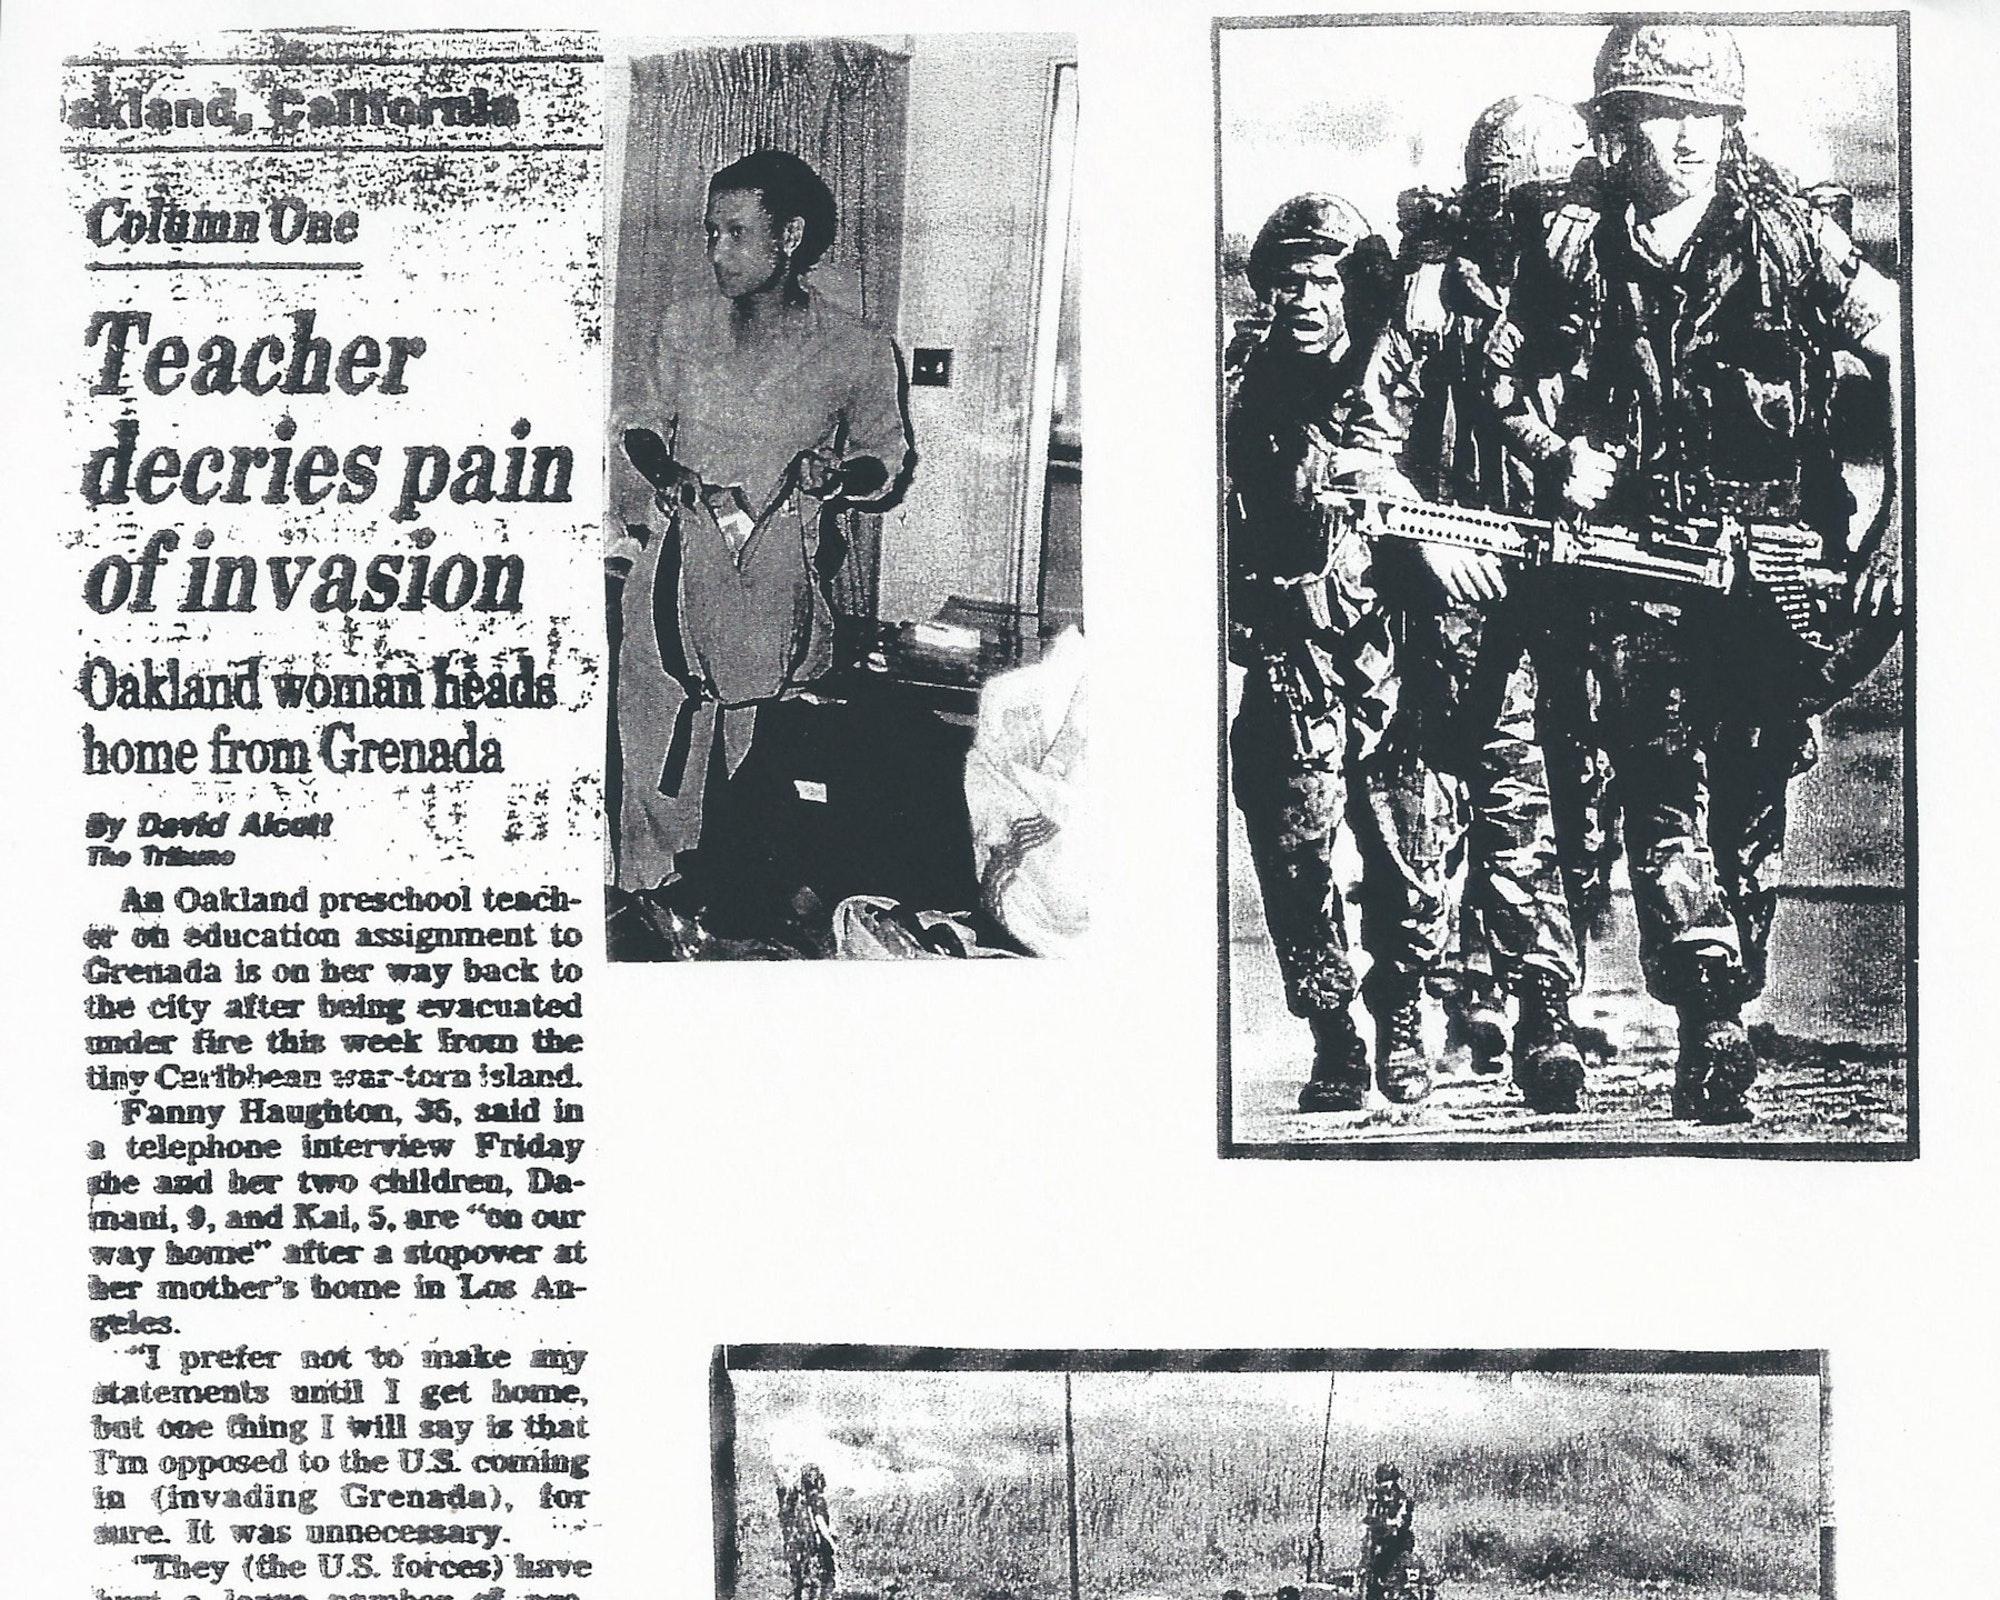 Black History, United States Military, Military Invasion, Invasion of Grenada, Maurice Bishop, Jacqueline Creft, Fannie Haughton, Angela Davis, Black Panthers, KOLUMN Magazine, KOLUMN